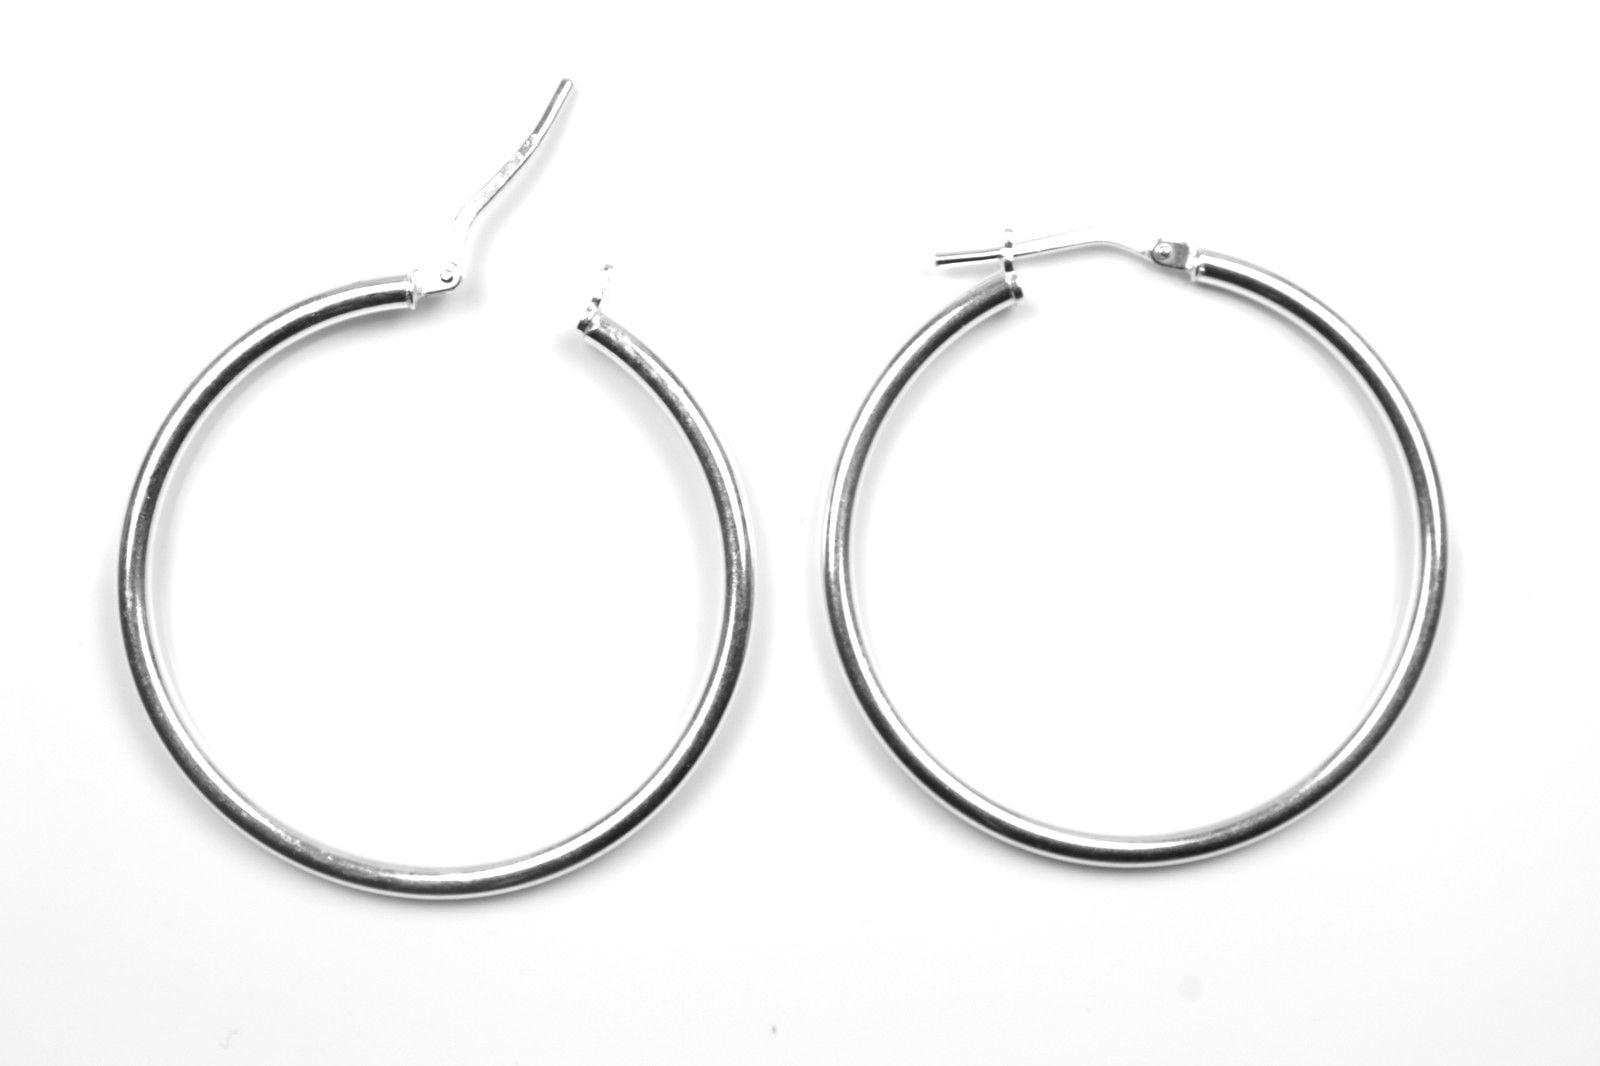 Arranview Jewellery Silver Hinged Heavy Weight Hoop Sleeper Earring (14mm) - Sterling Silver PTQQLVeU3b